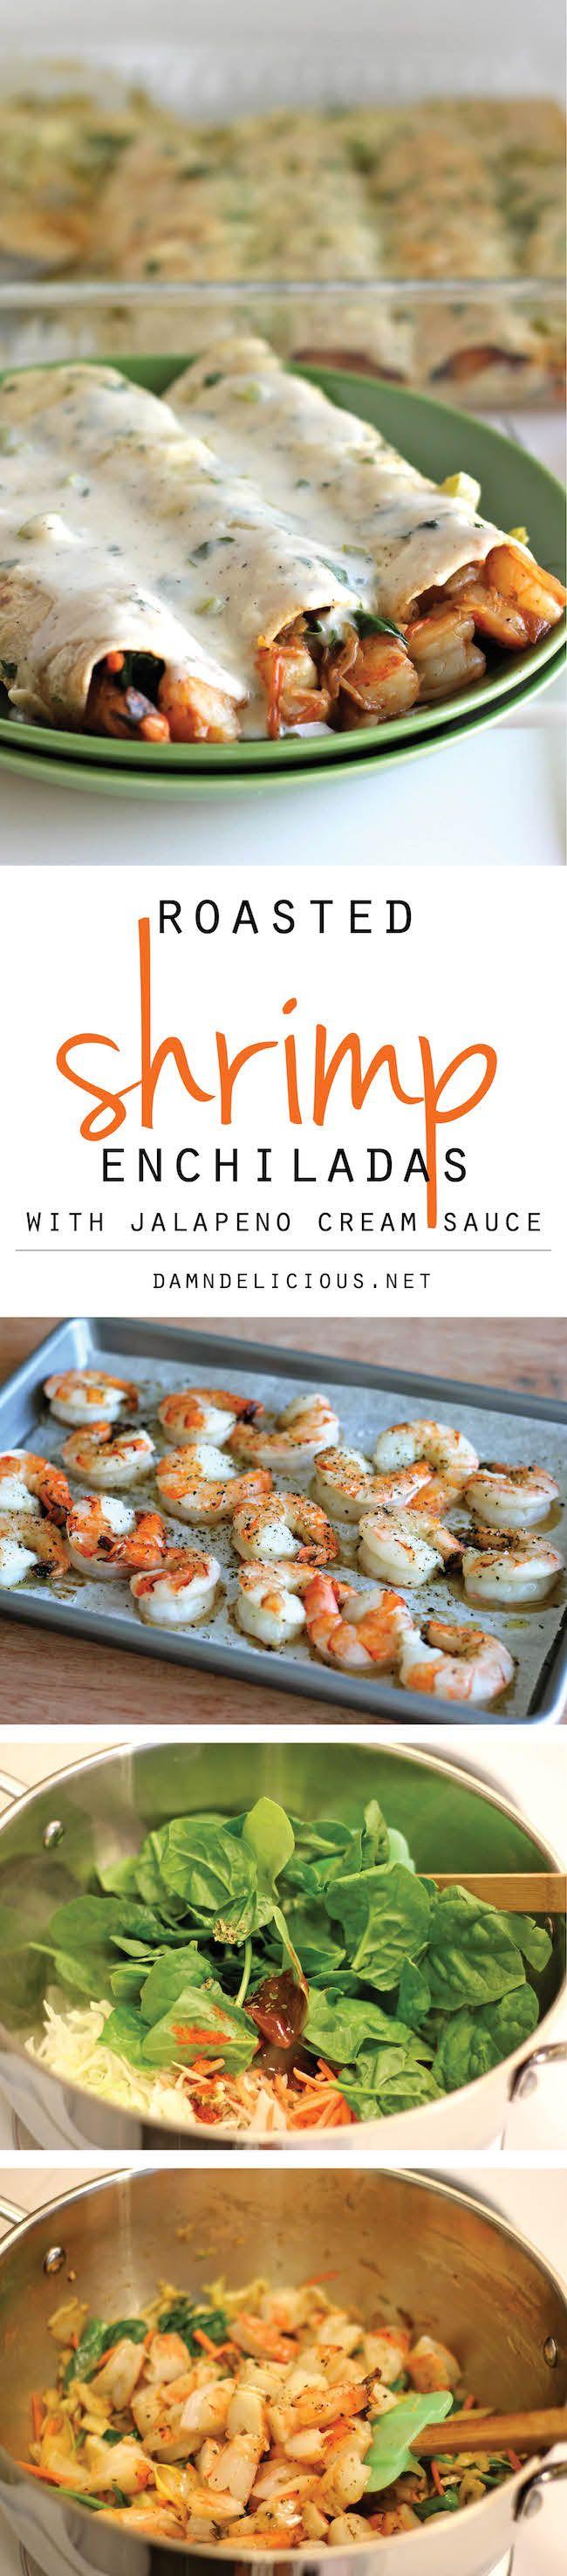 Roasted Shrimp Enchiladas with Jalapeño Cream Sauce - Smothered in a rich, jalapeño cream sauce, how can you resist?!